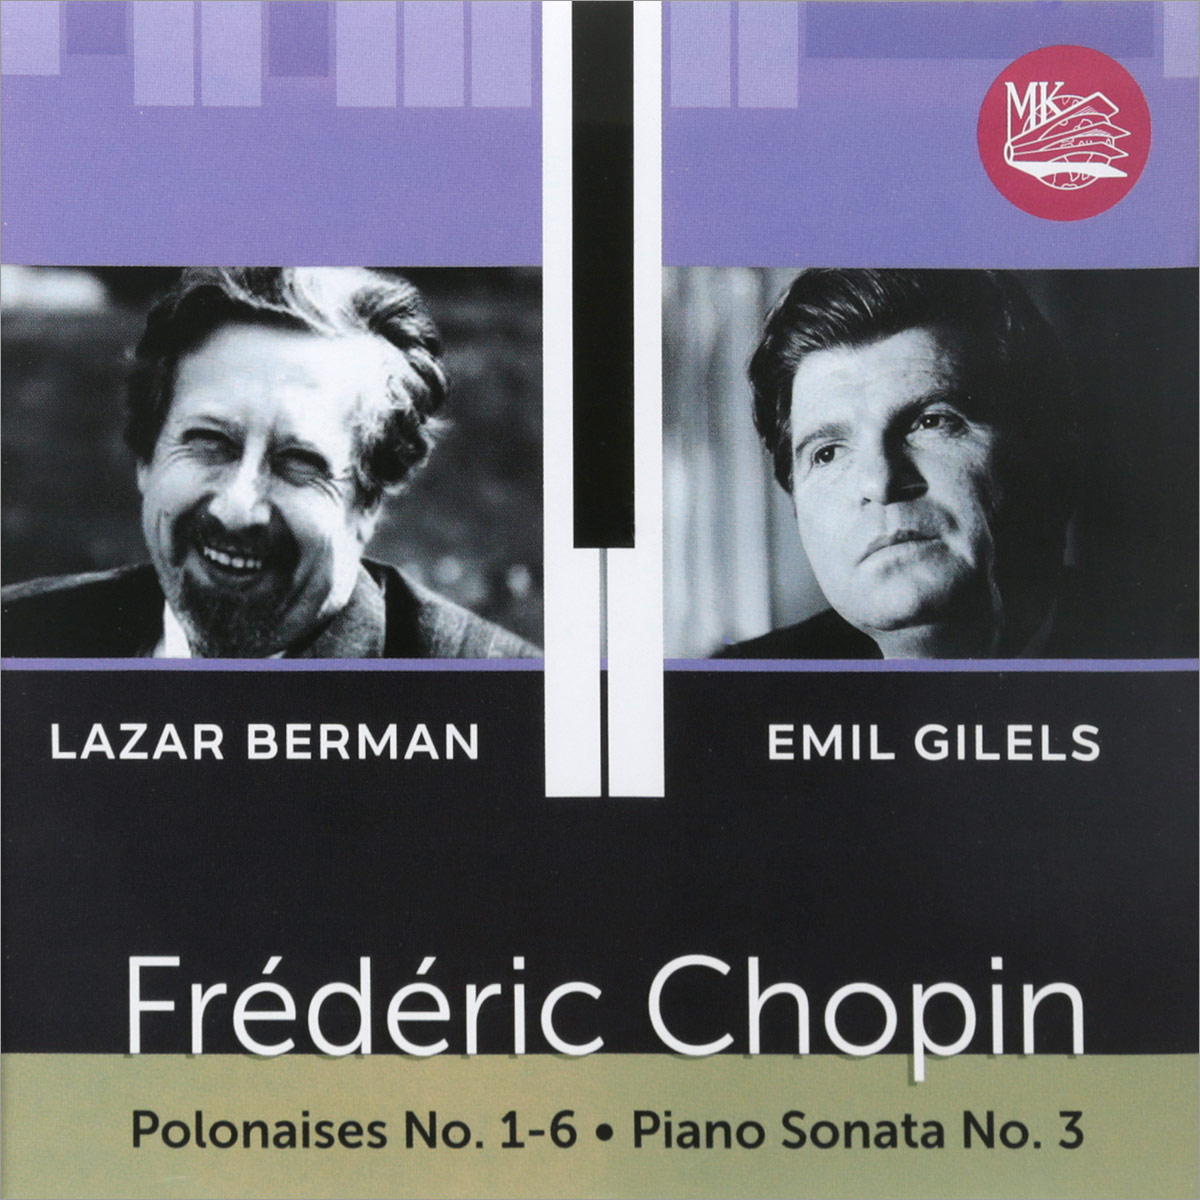 Лазарь Берман,Эмиль Гилельс Lazar Berman, Emil Gilels. Chopin. Polonaises No. 1-6 / Piano Sonata No. 3 ���������� �������������� ������������ ���������� l beethoven piano and sonatas 3 5 9 emil gilels leonid cogan